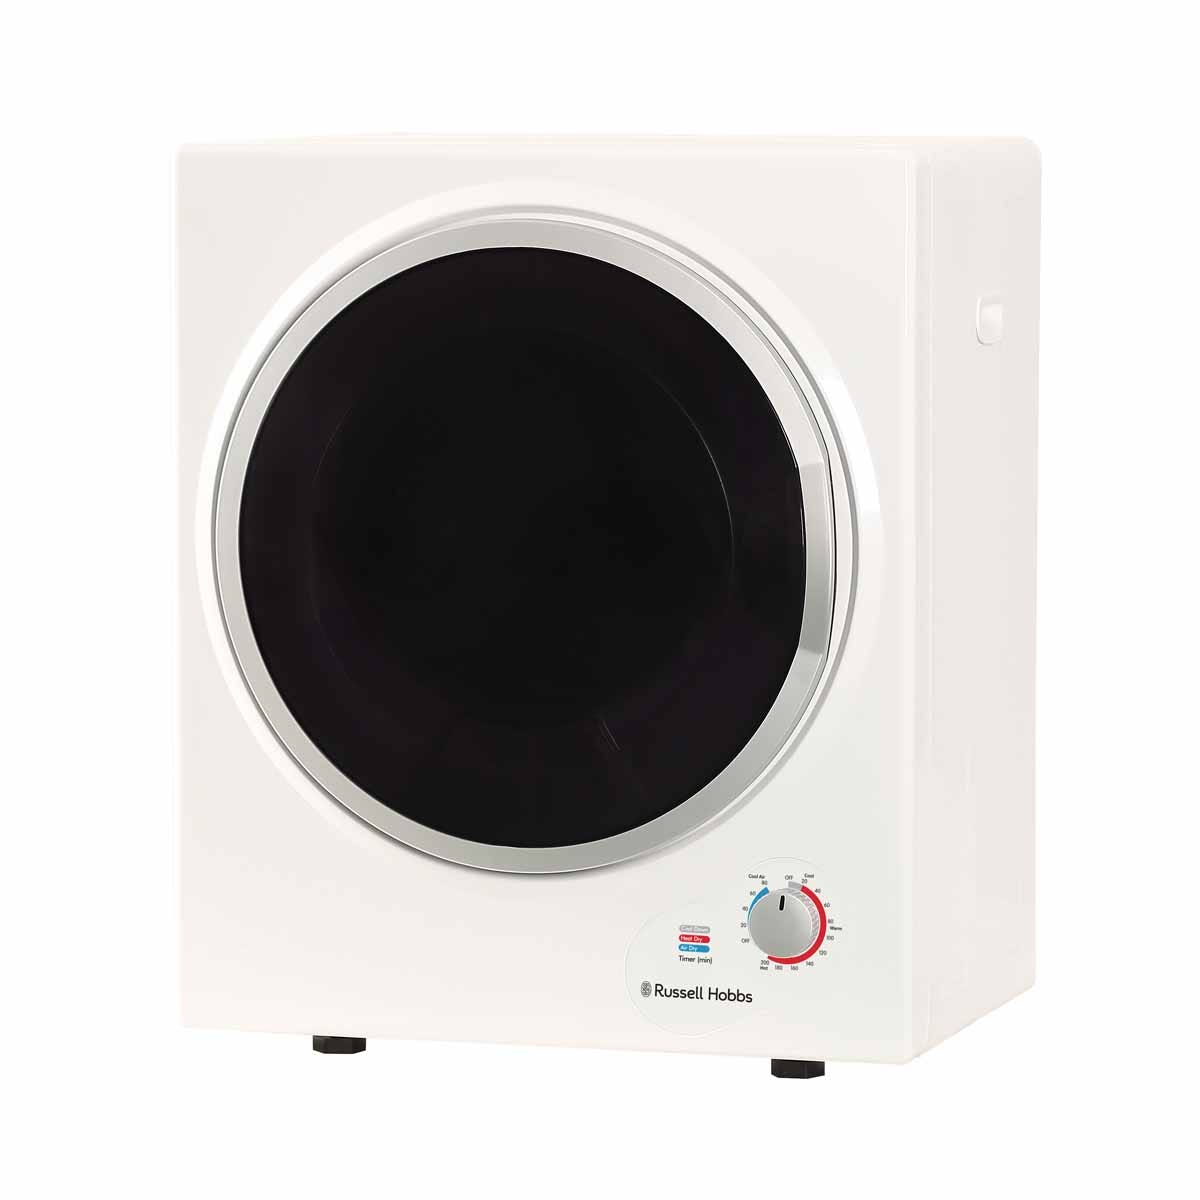 Russell Hobbs RH3VTD800 2.5kg Compact Vented Tumble Dryer - White